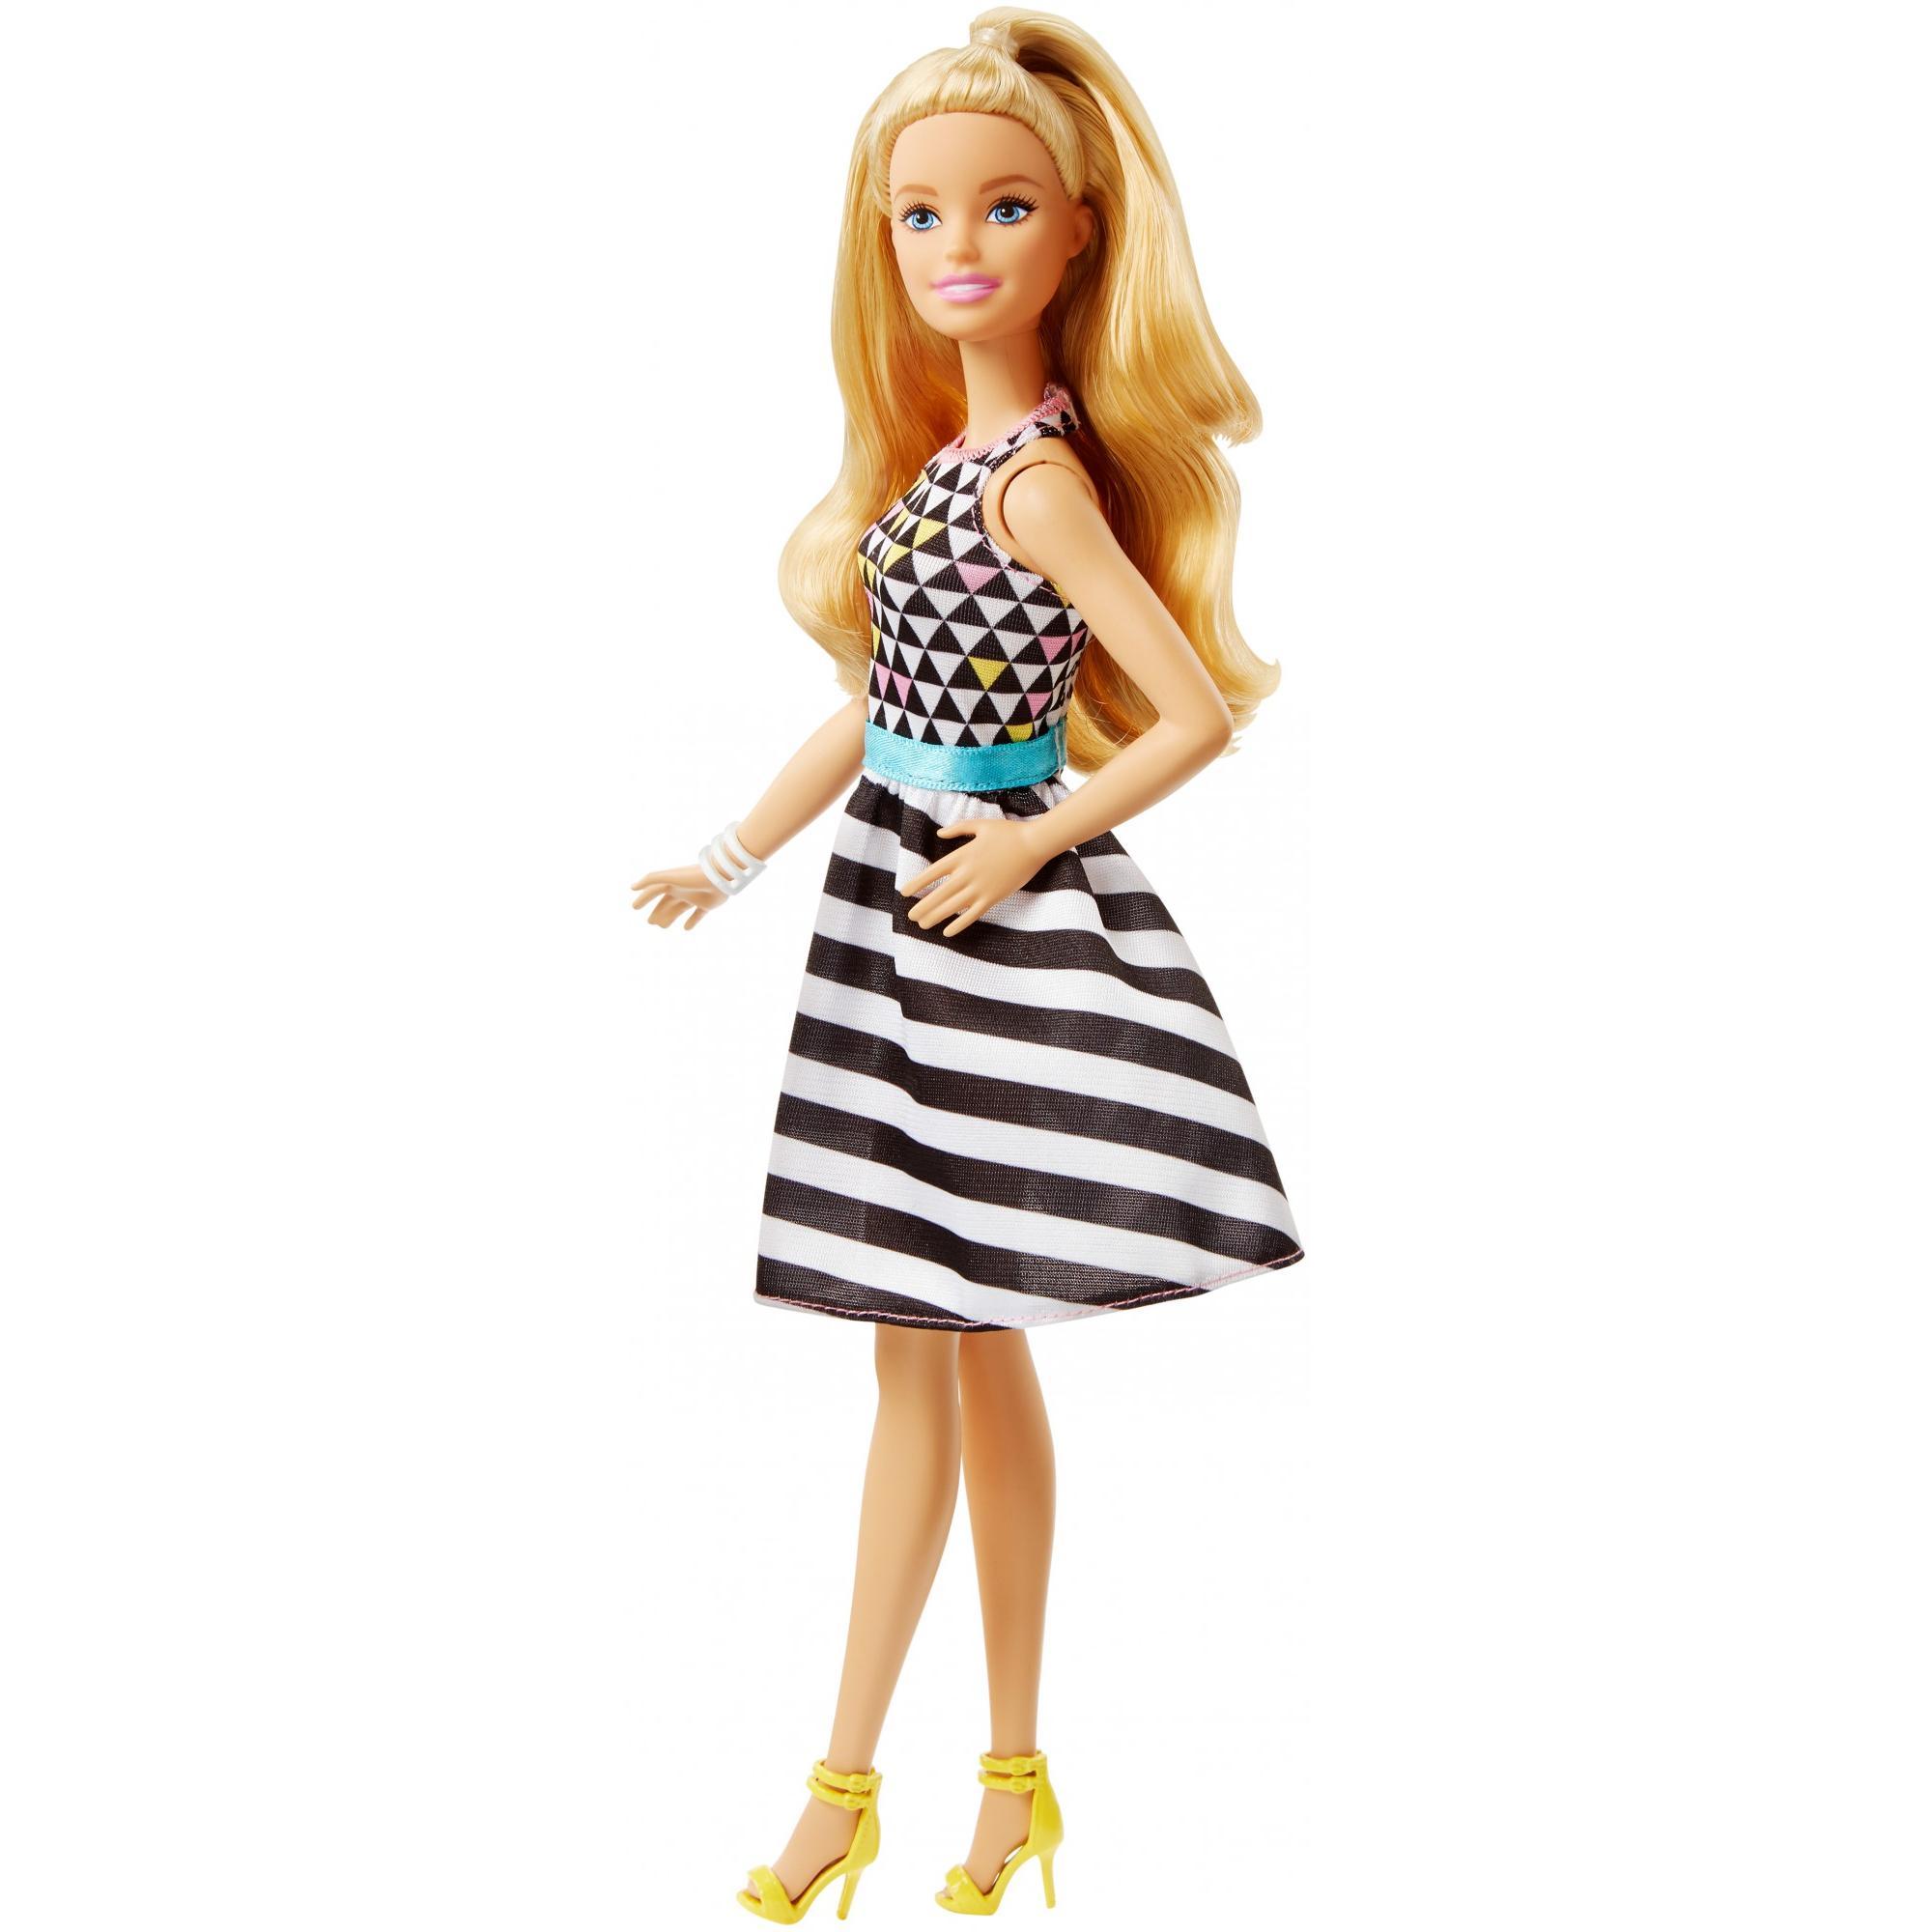 Barbie Fashionistas Power Print, Original Body Doll